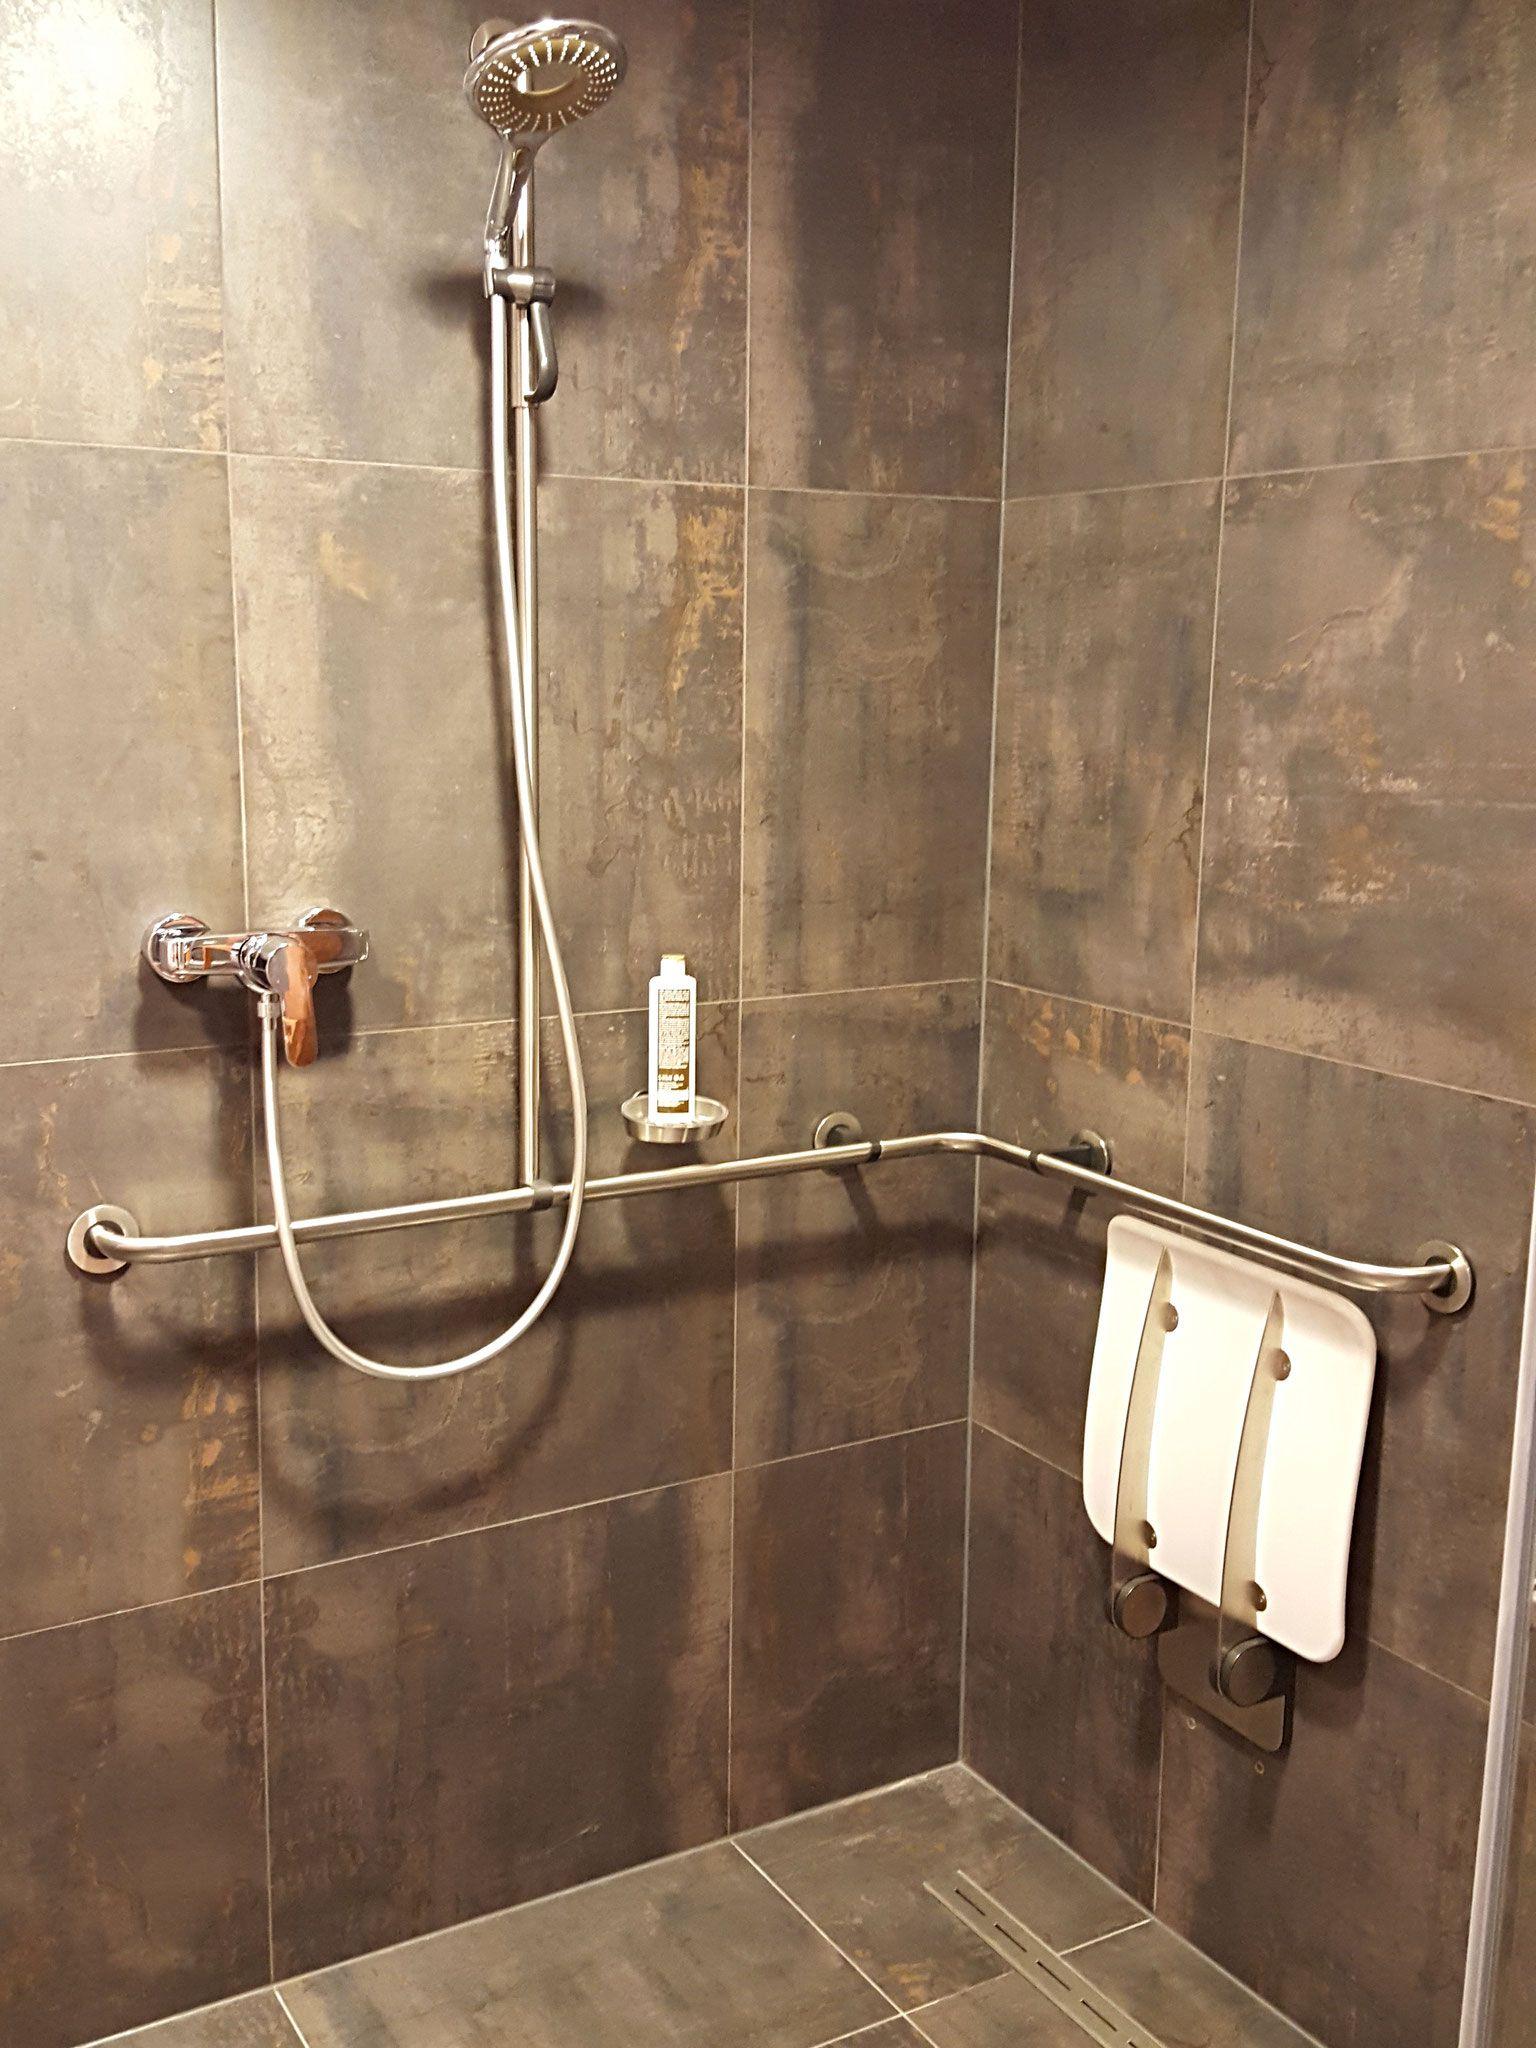 Behindertengerechte Dusche Behindertengerechtes Bad Dusche Barrierefrei Bad